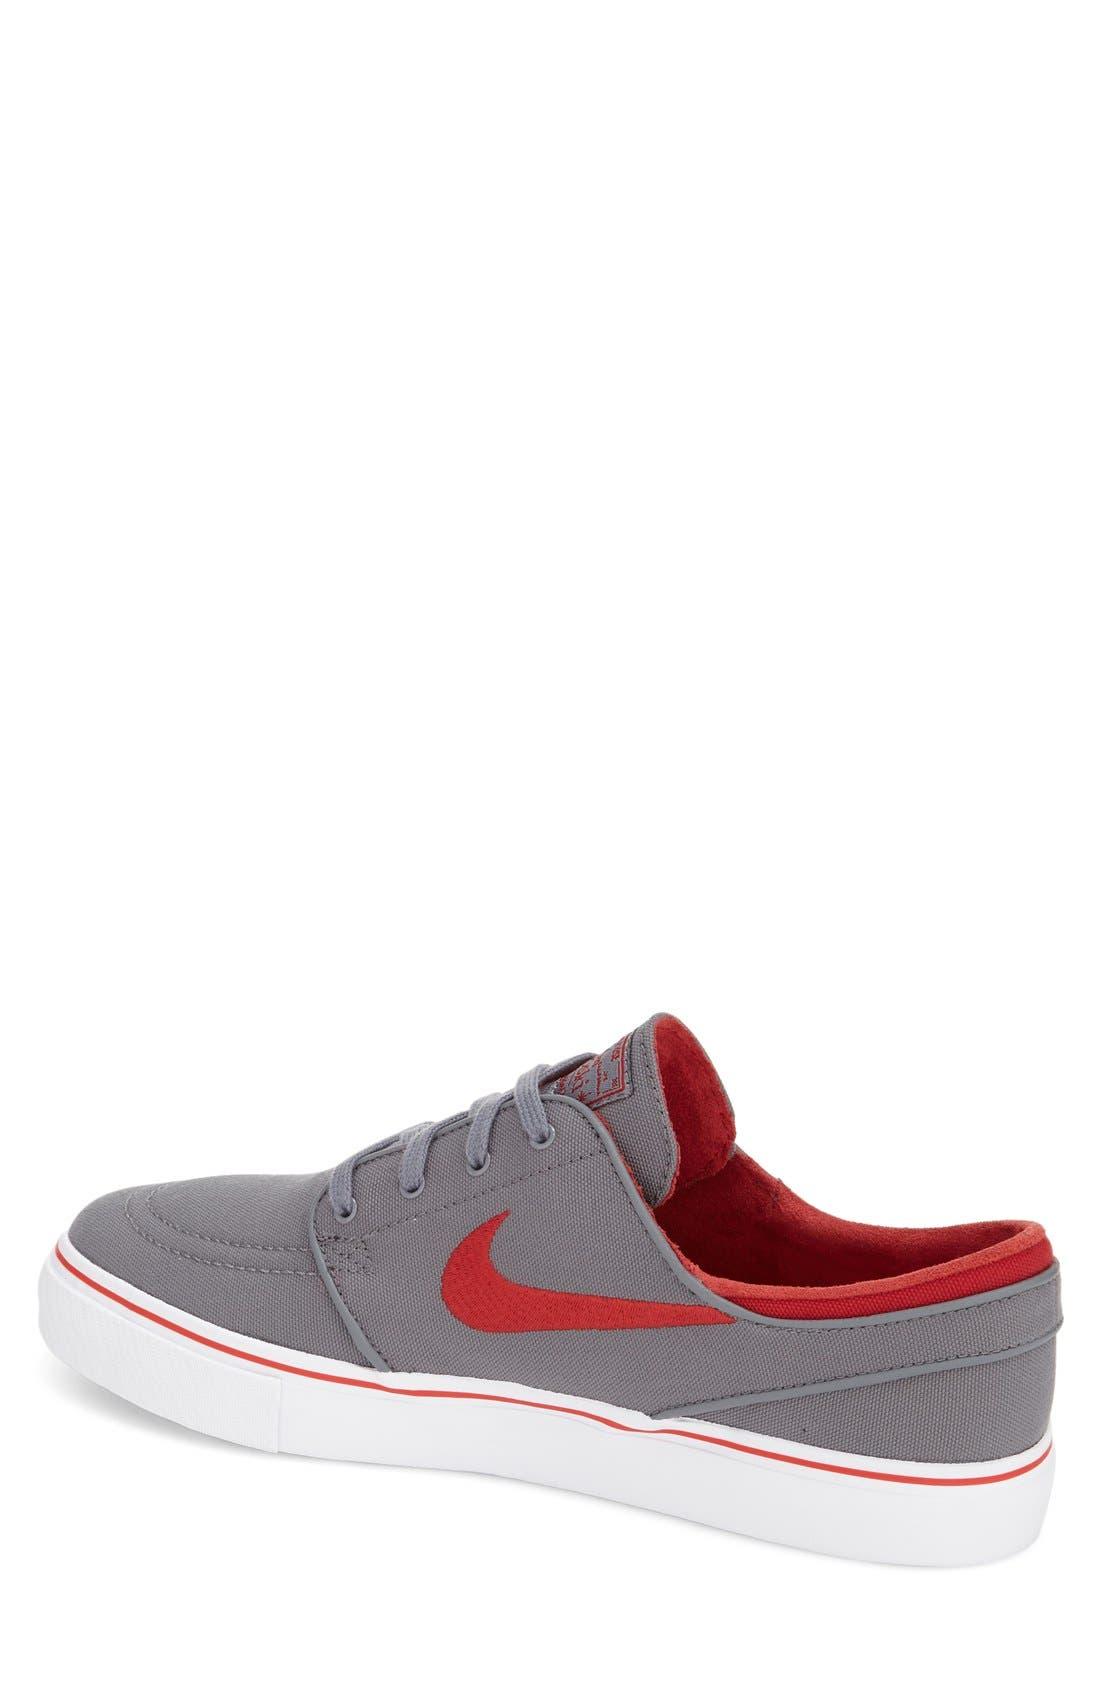 Zoom - Stefan Janoski SB Canvas Skate Shoe,                             Alternate thumbnail 149, color,